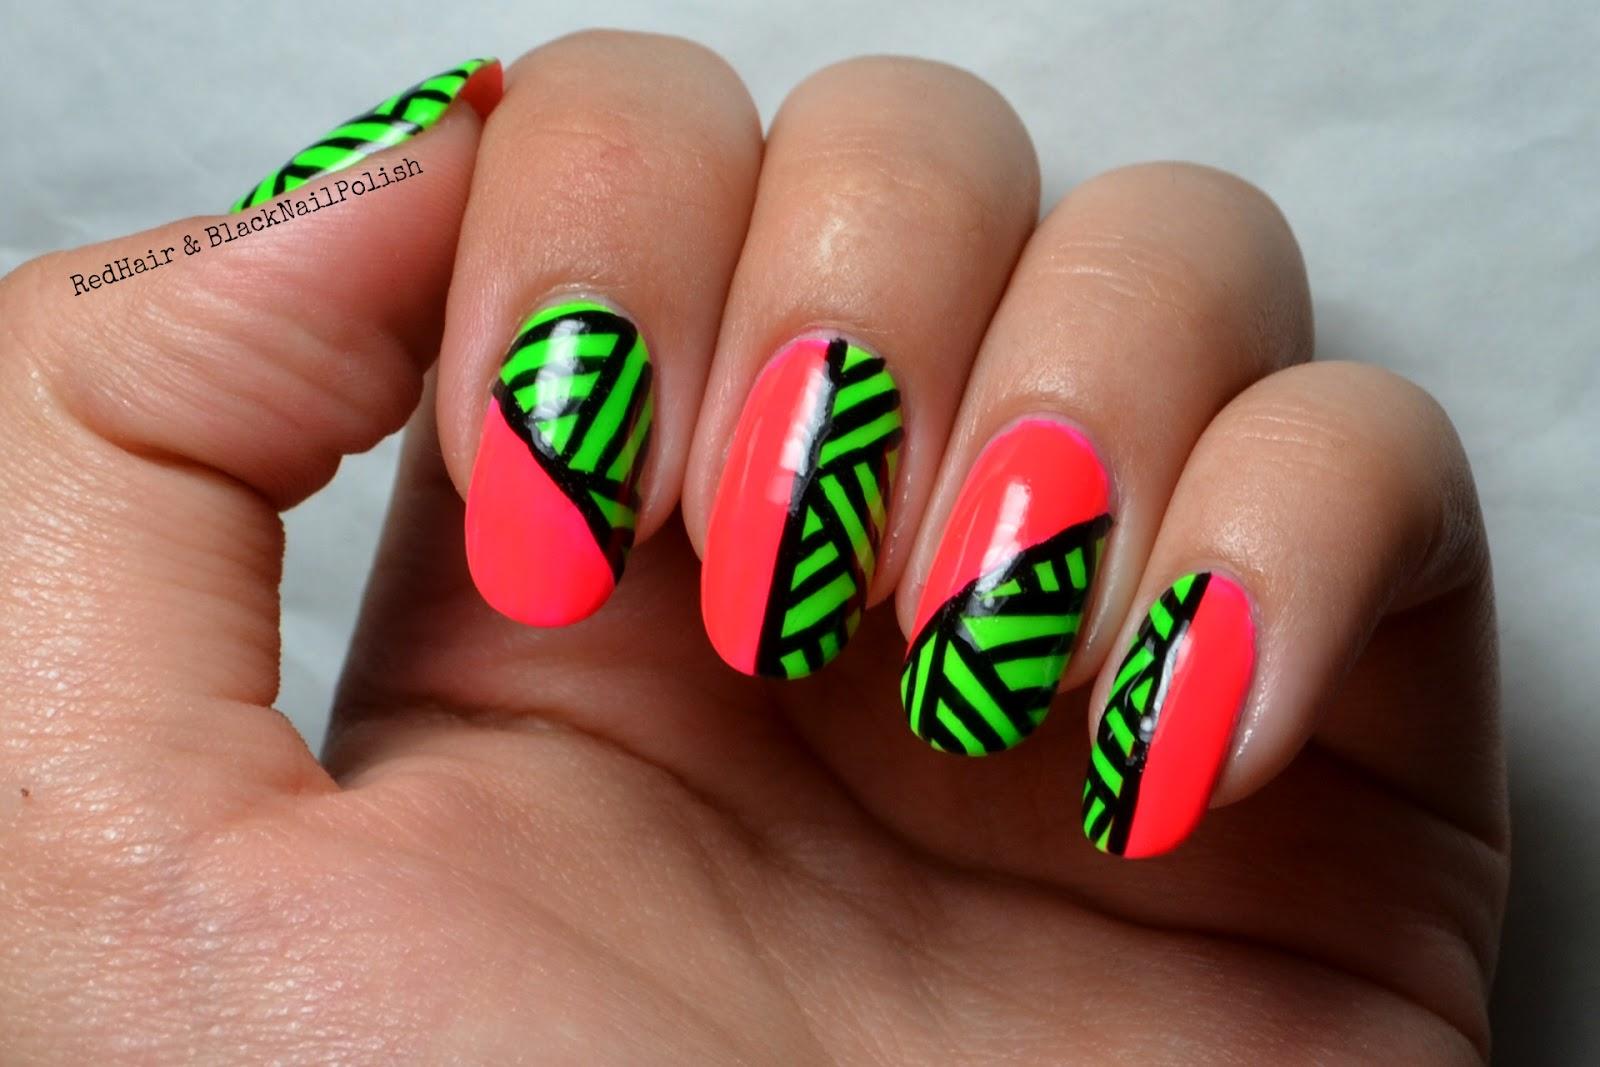 Neon Nail Designs - Pccala